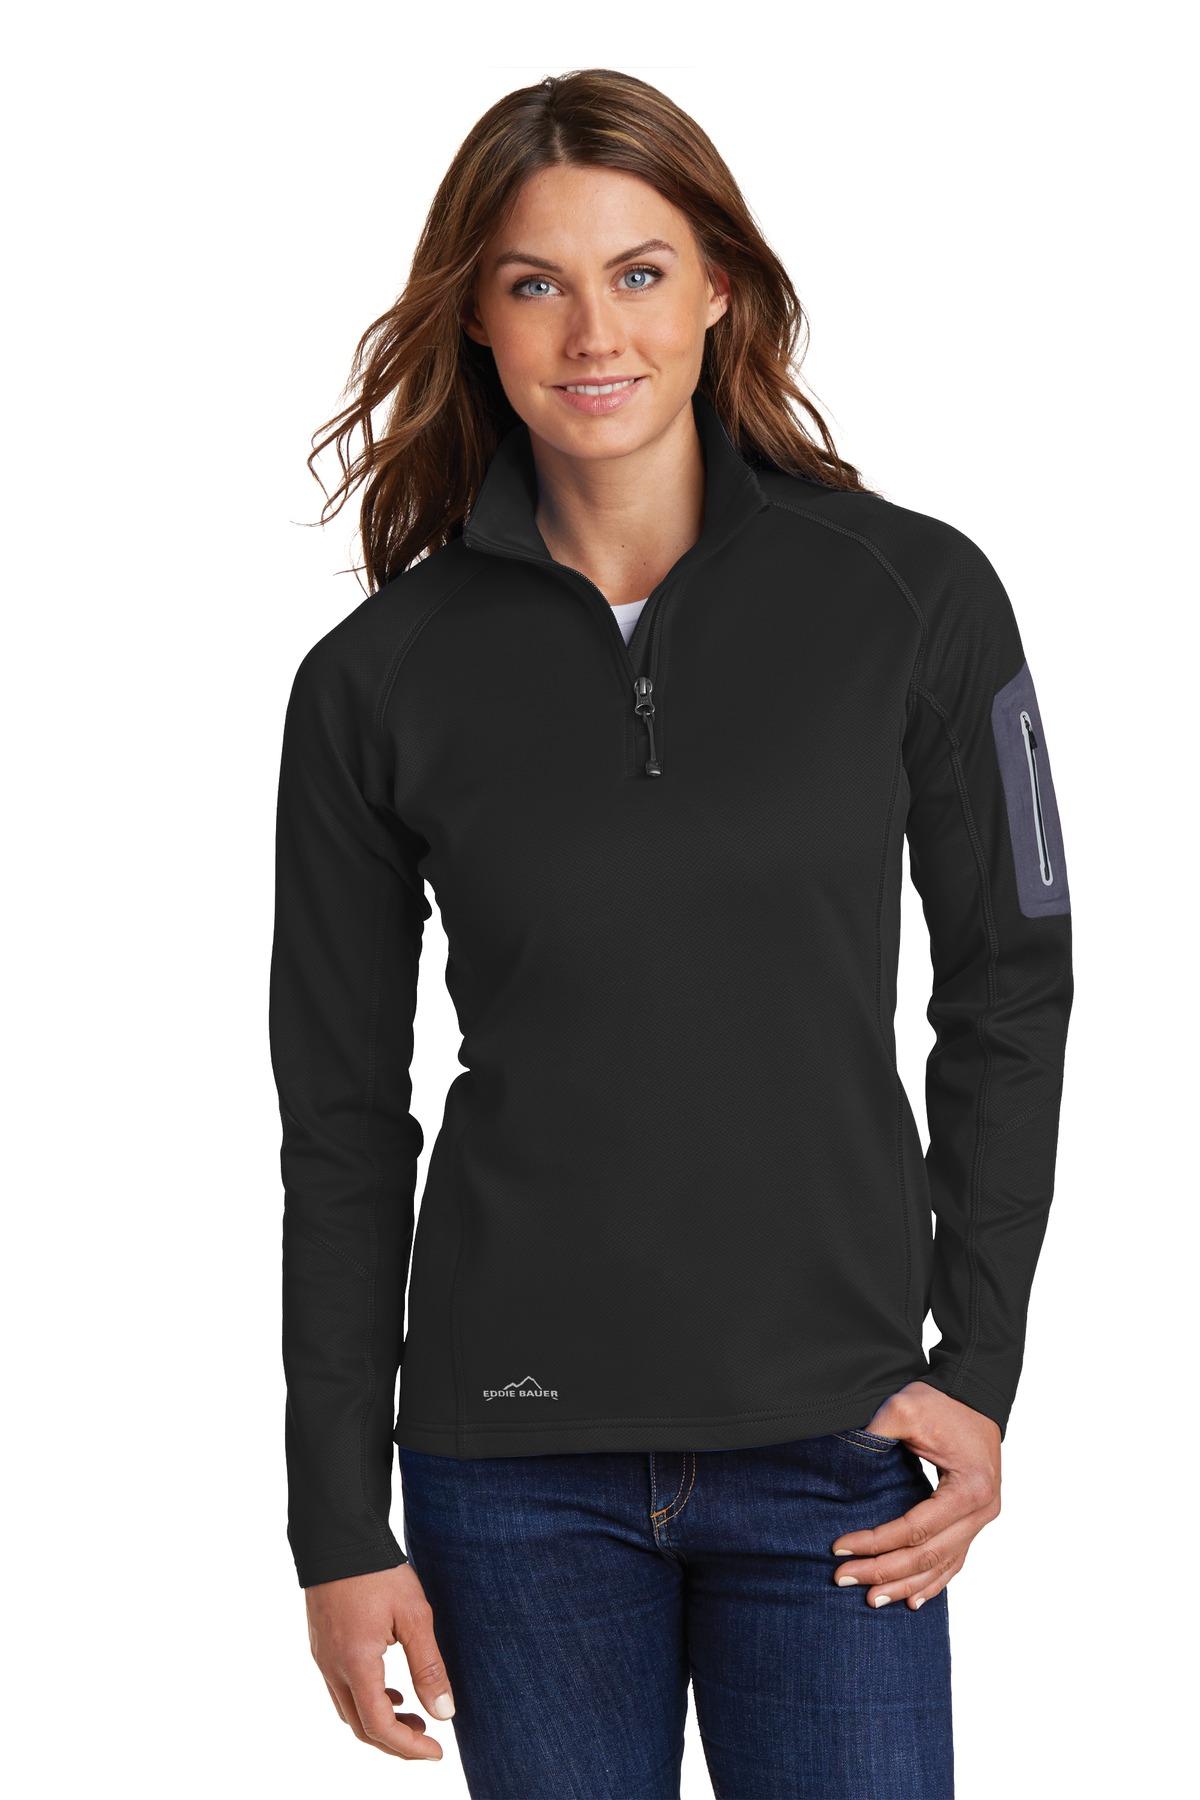 Eddie Bauer EB235 - Ladies 1/2-Zip Performance Fleece Jacket ...